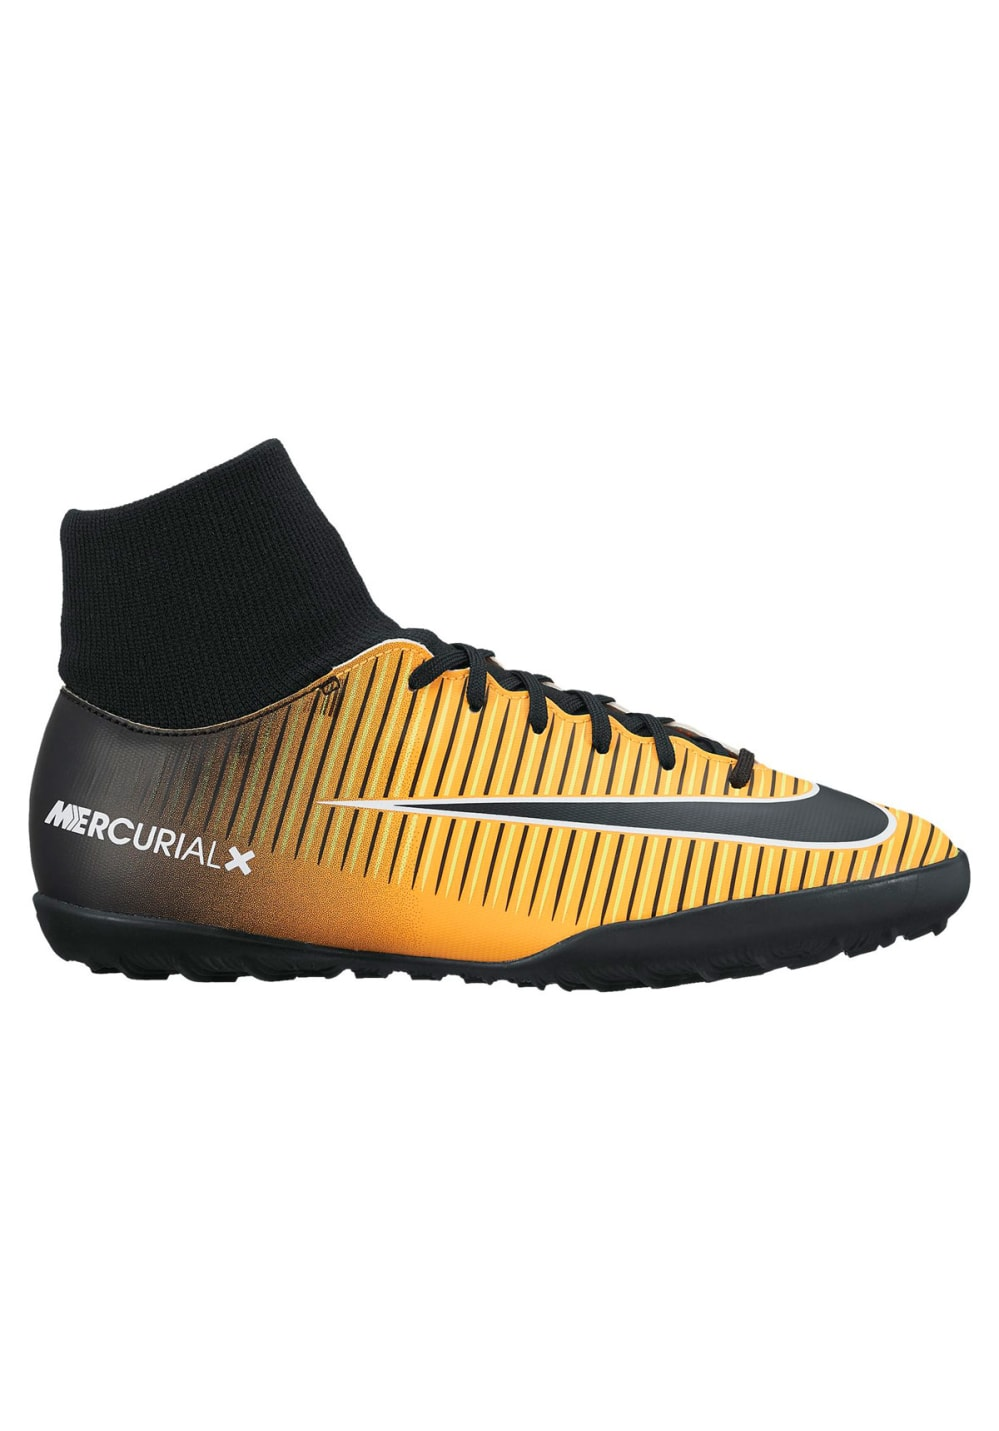 1d5ea120644 Next. Nike. Mercurial Victory VI CR7 Dynamic Fit TF - Fußballschuhe